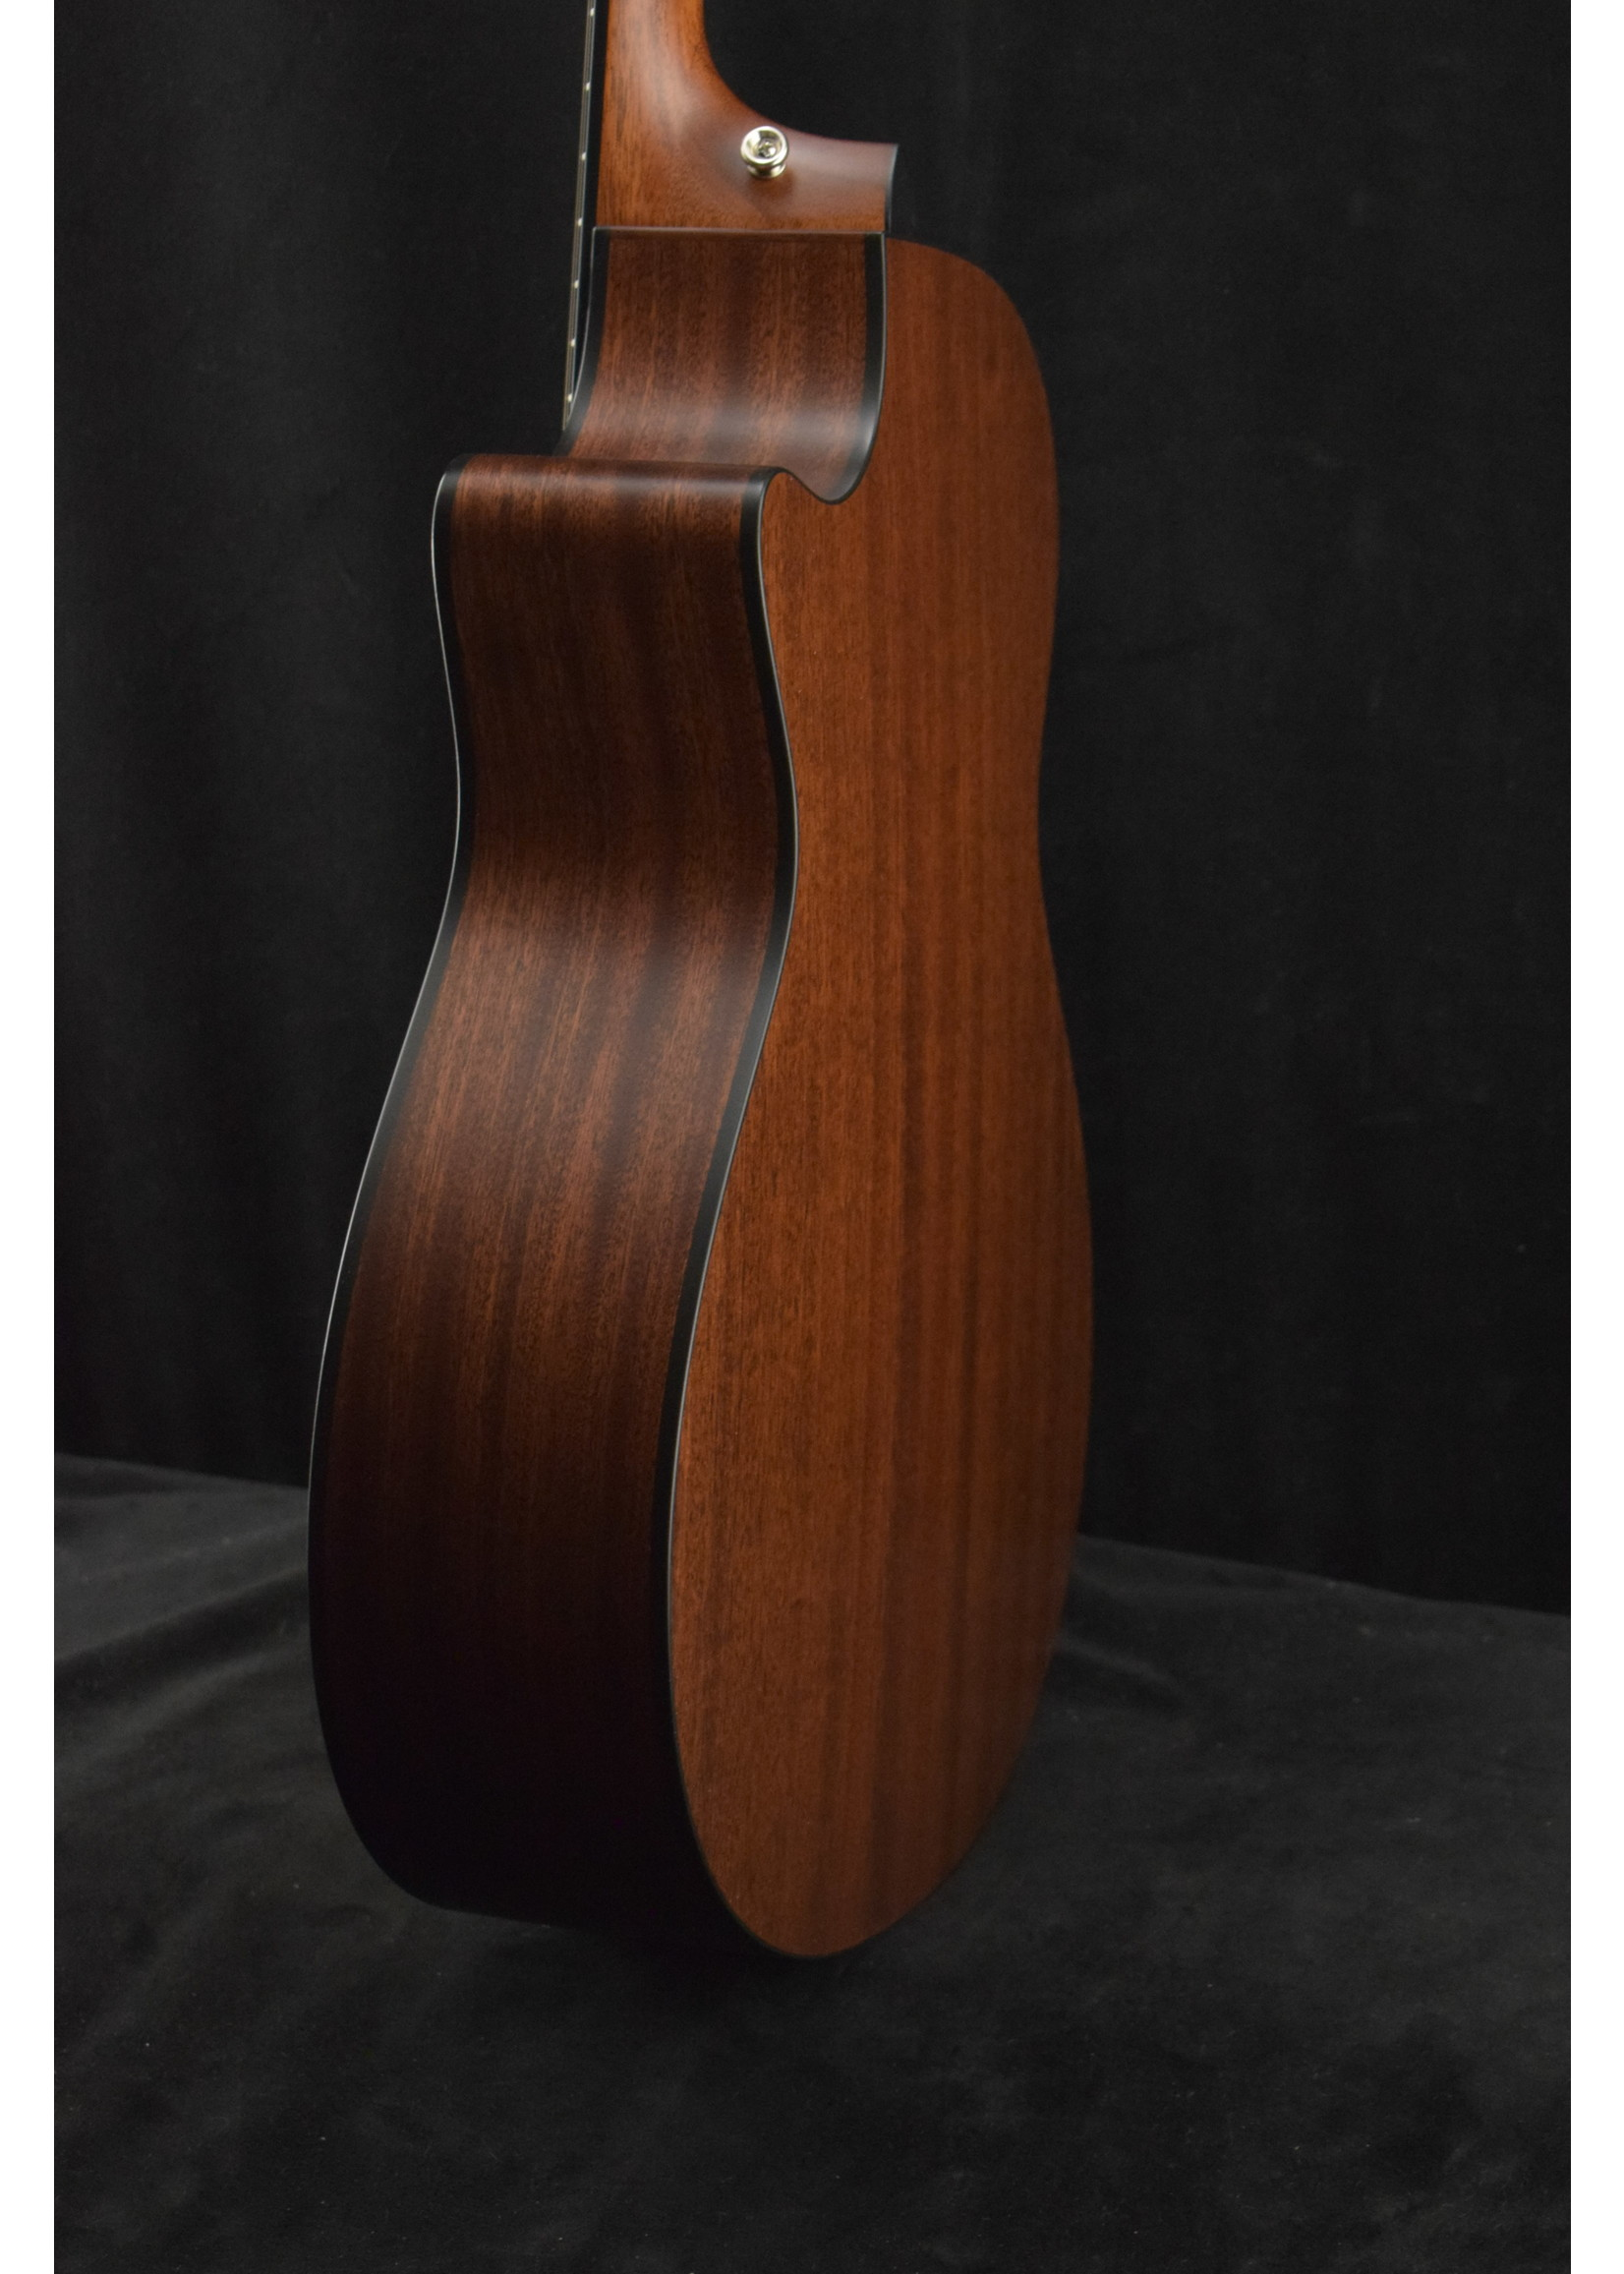 Taylor Taylor 352ce 12-Fret 12-String Natural